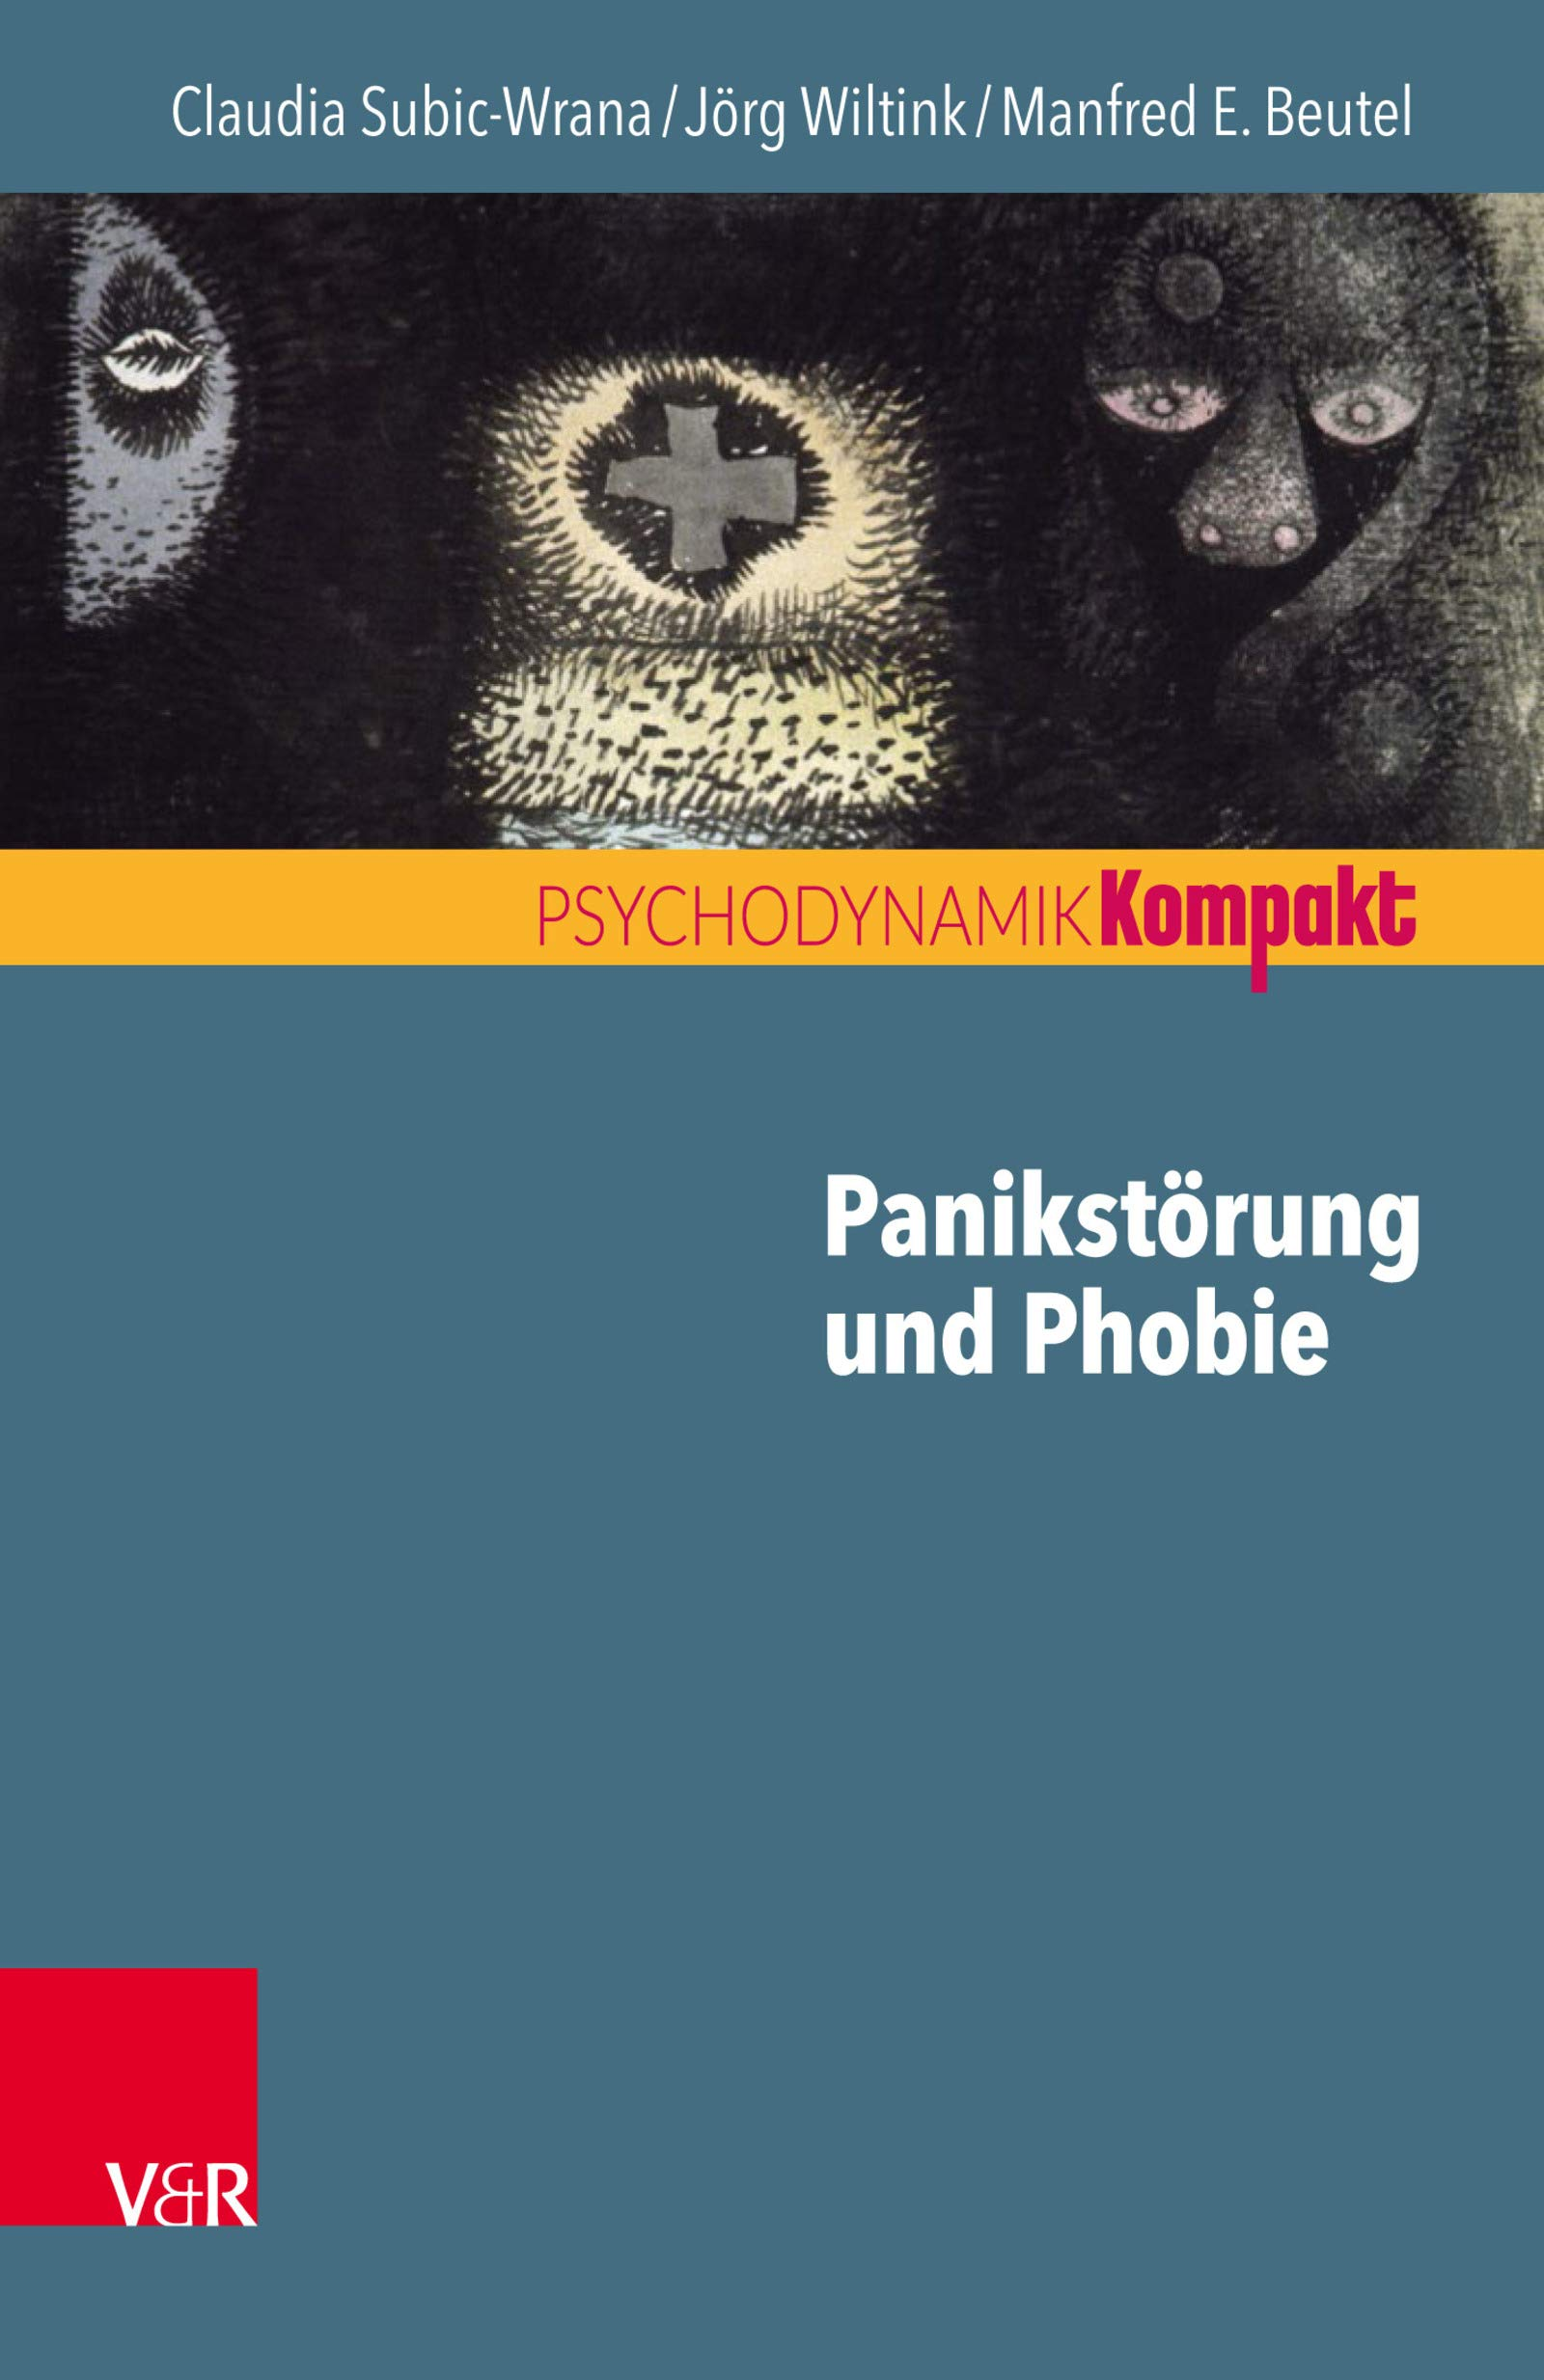 Panikstörung Und Phobie  Psychodynamik Kompakt